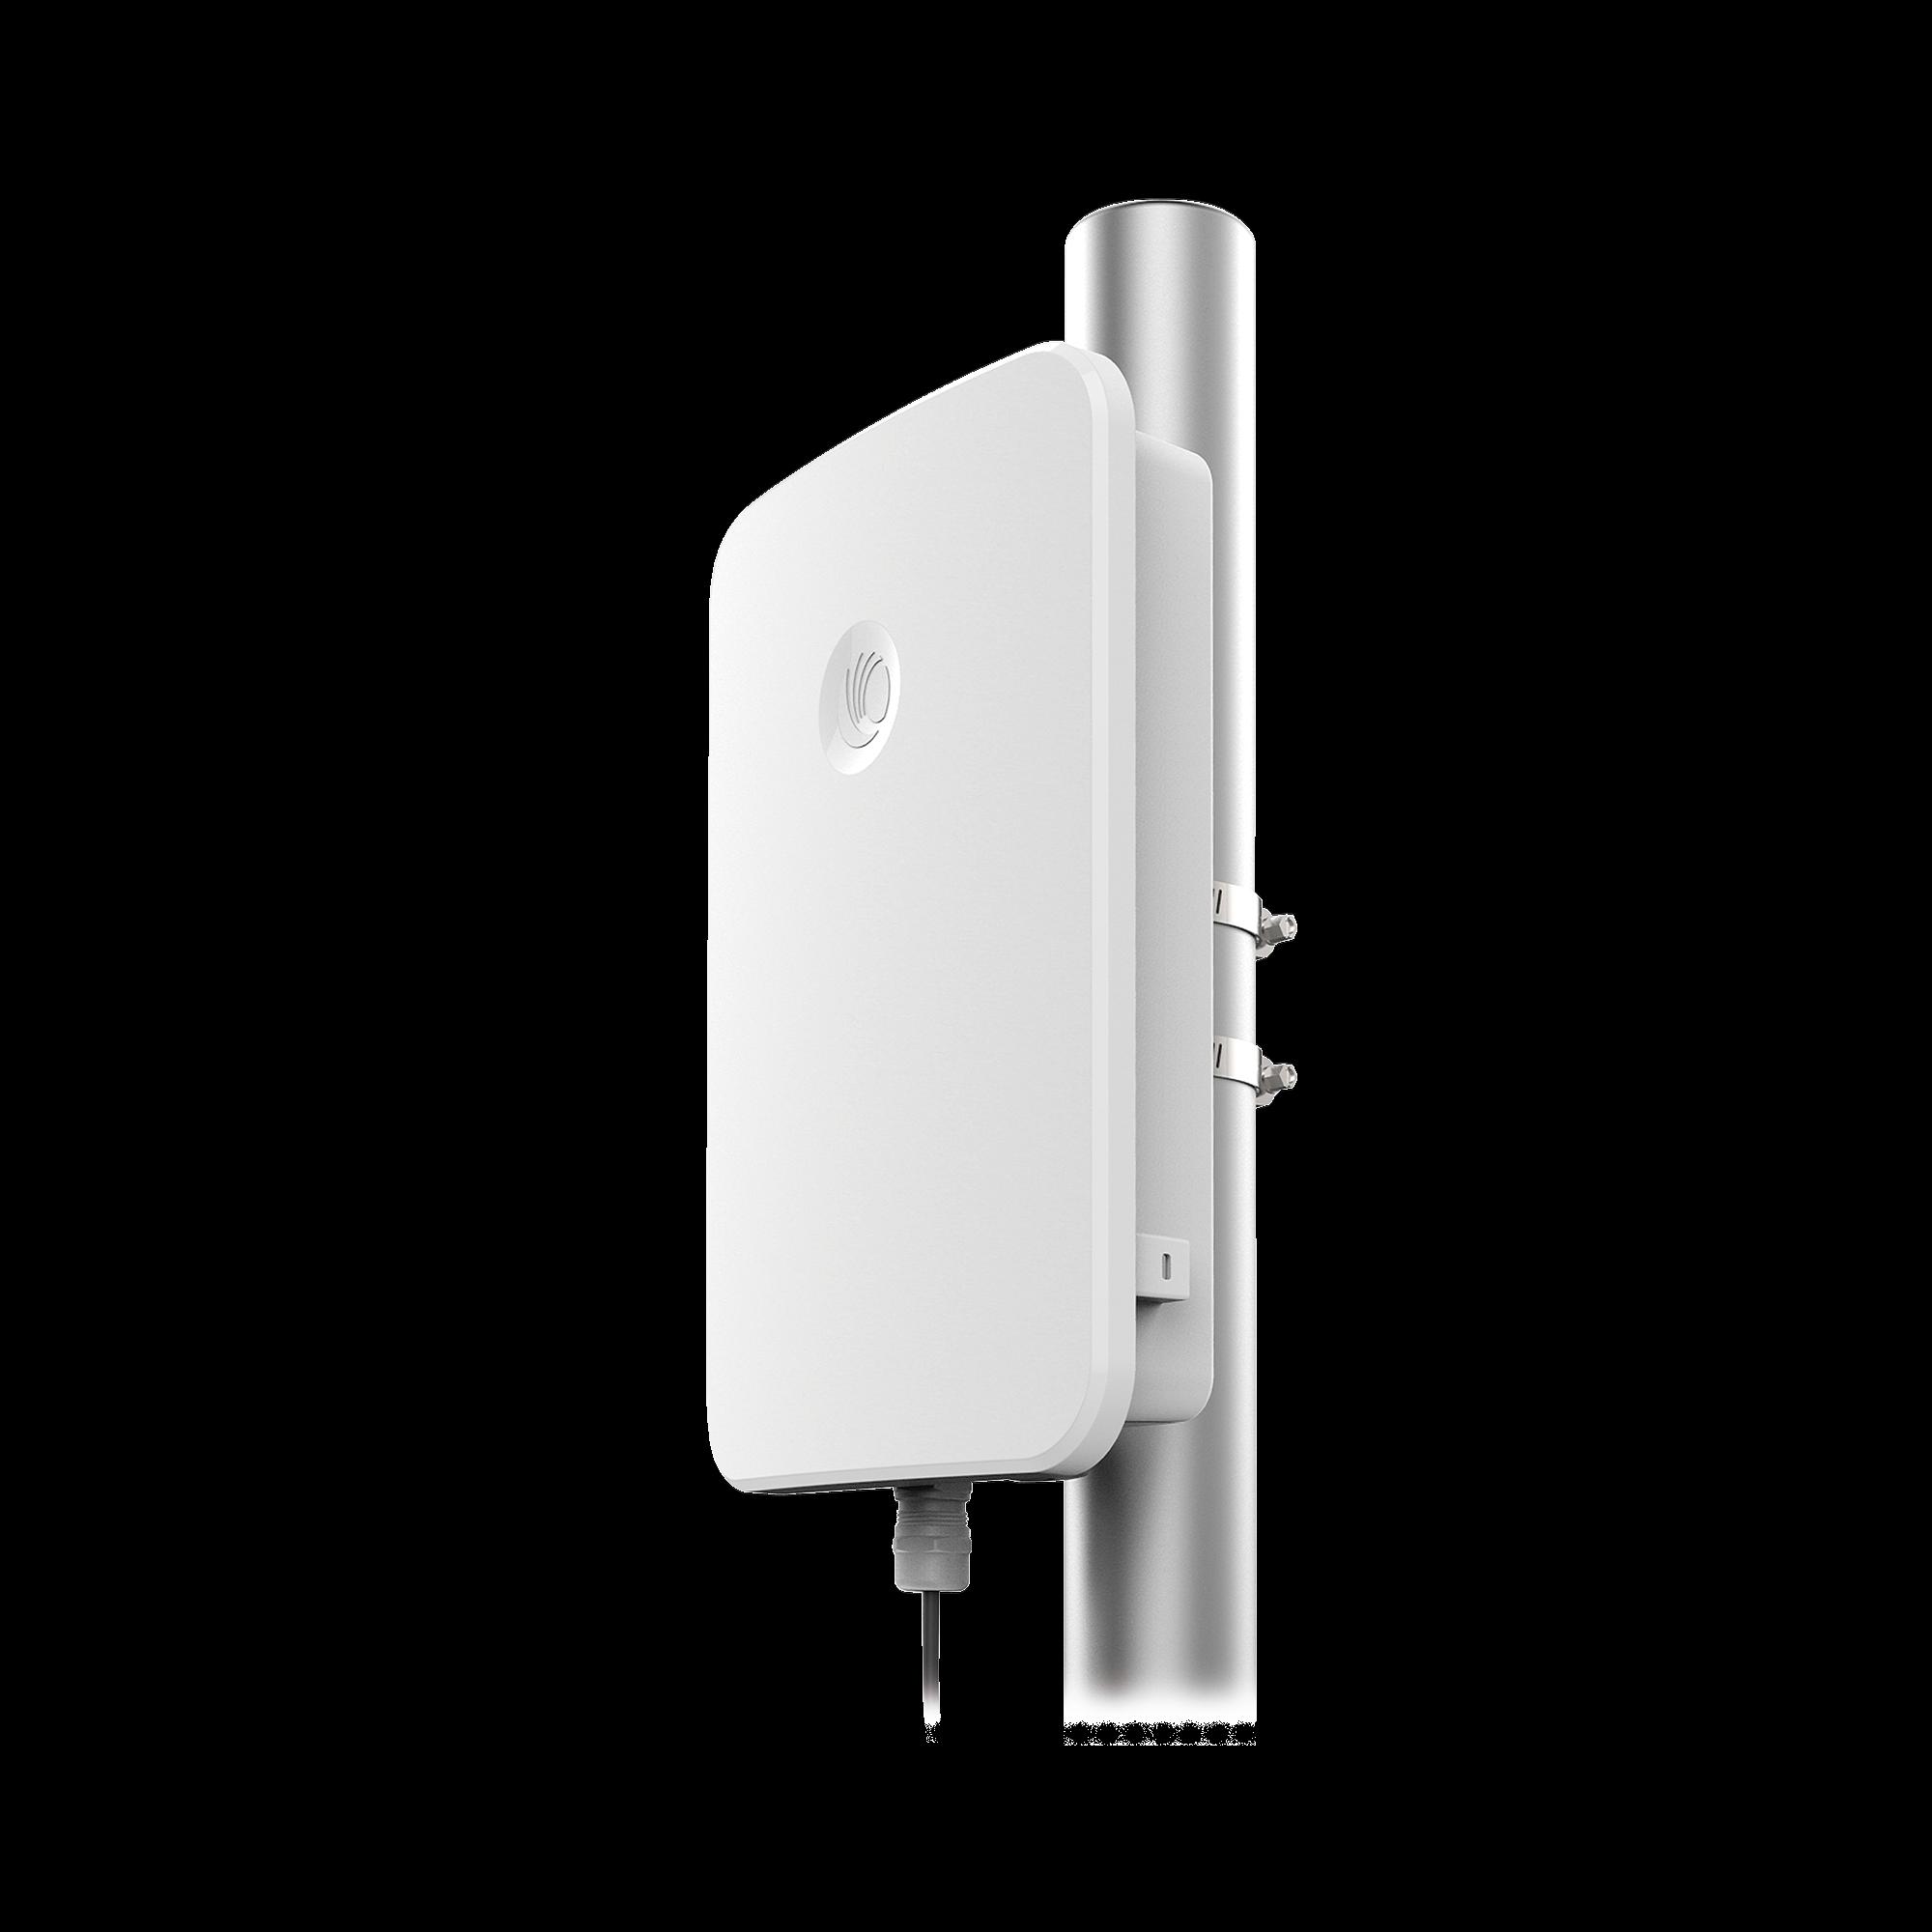 Access Point WiFi cnPilot e700 para alta densidad de usuarios, para exterior, IP-67 grado industrial, para temperaturas extremas, doble banda, antena Beamforming omnidireccional